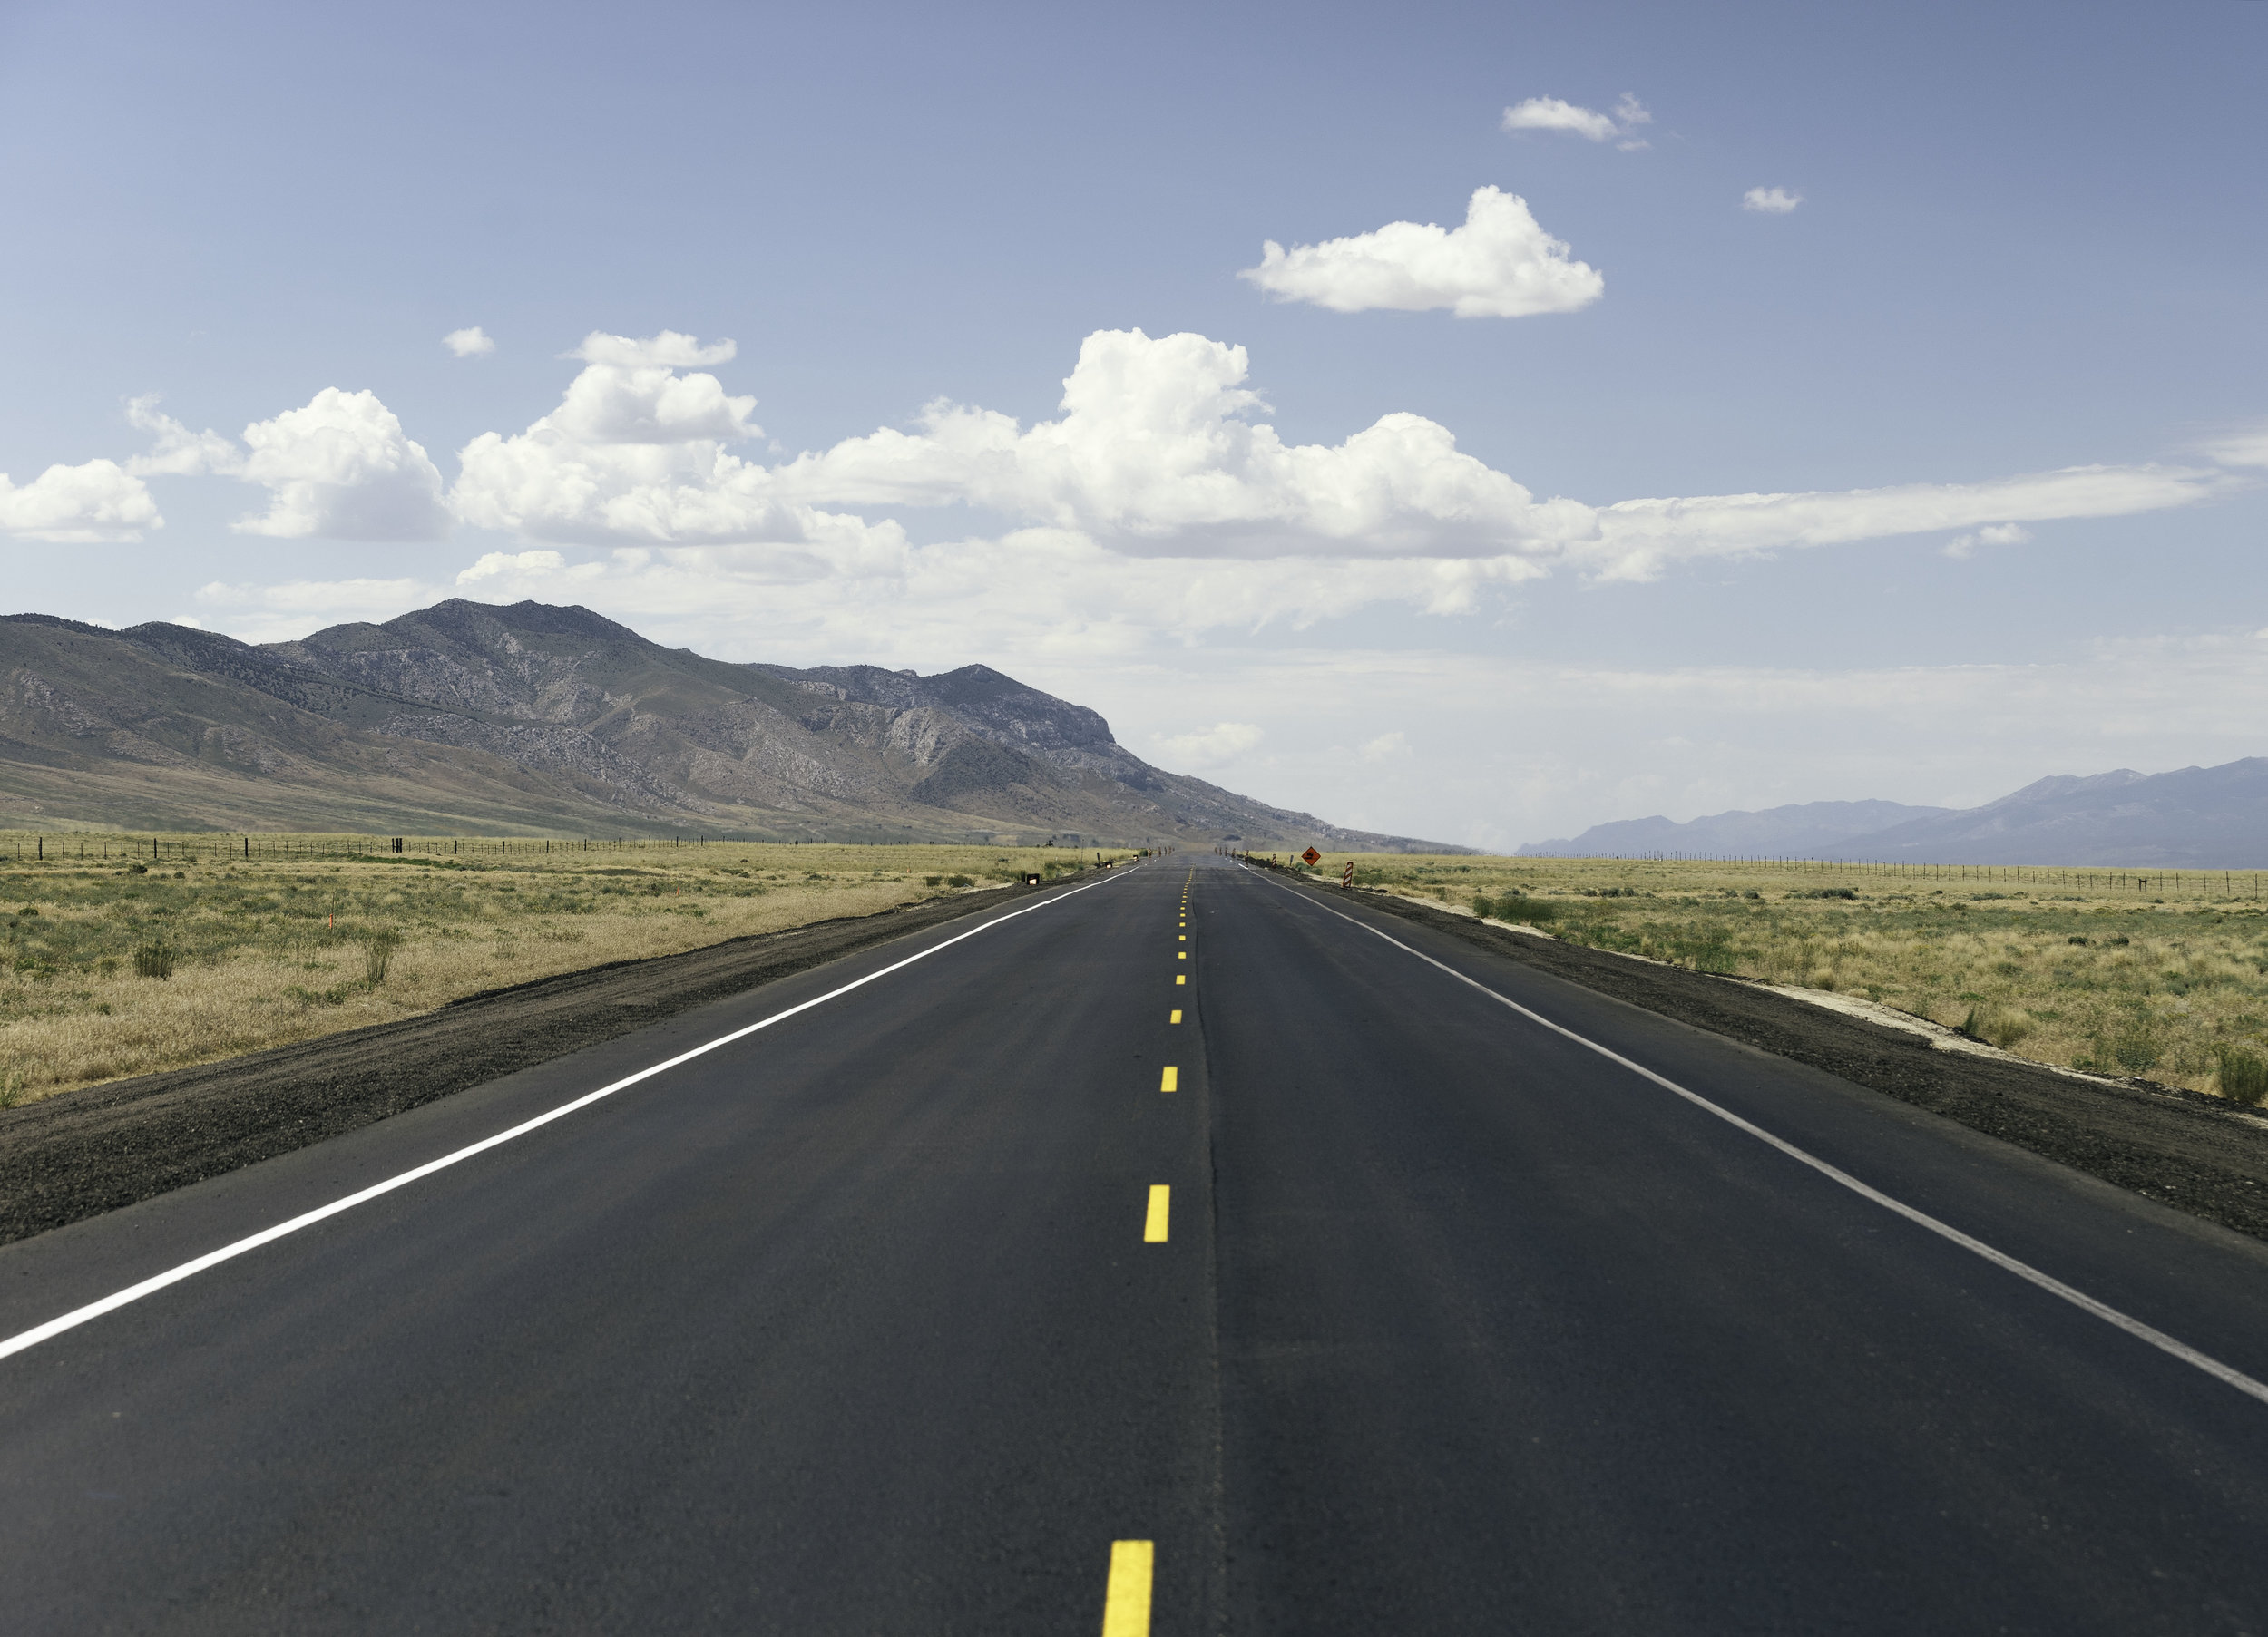 openroad.jpg